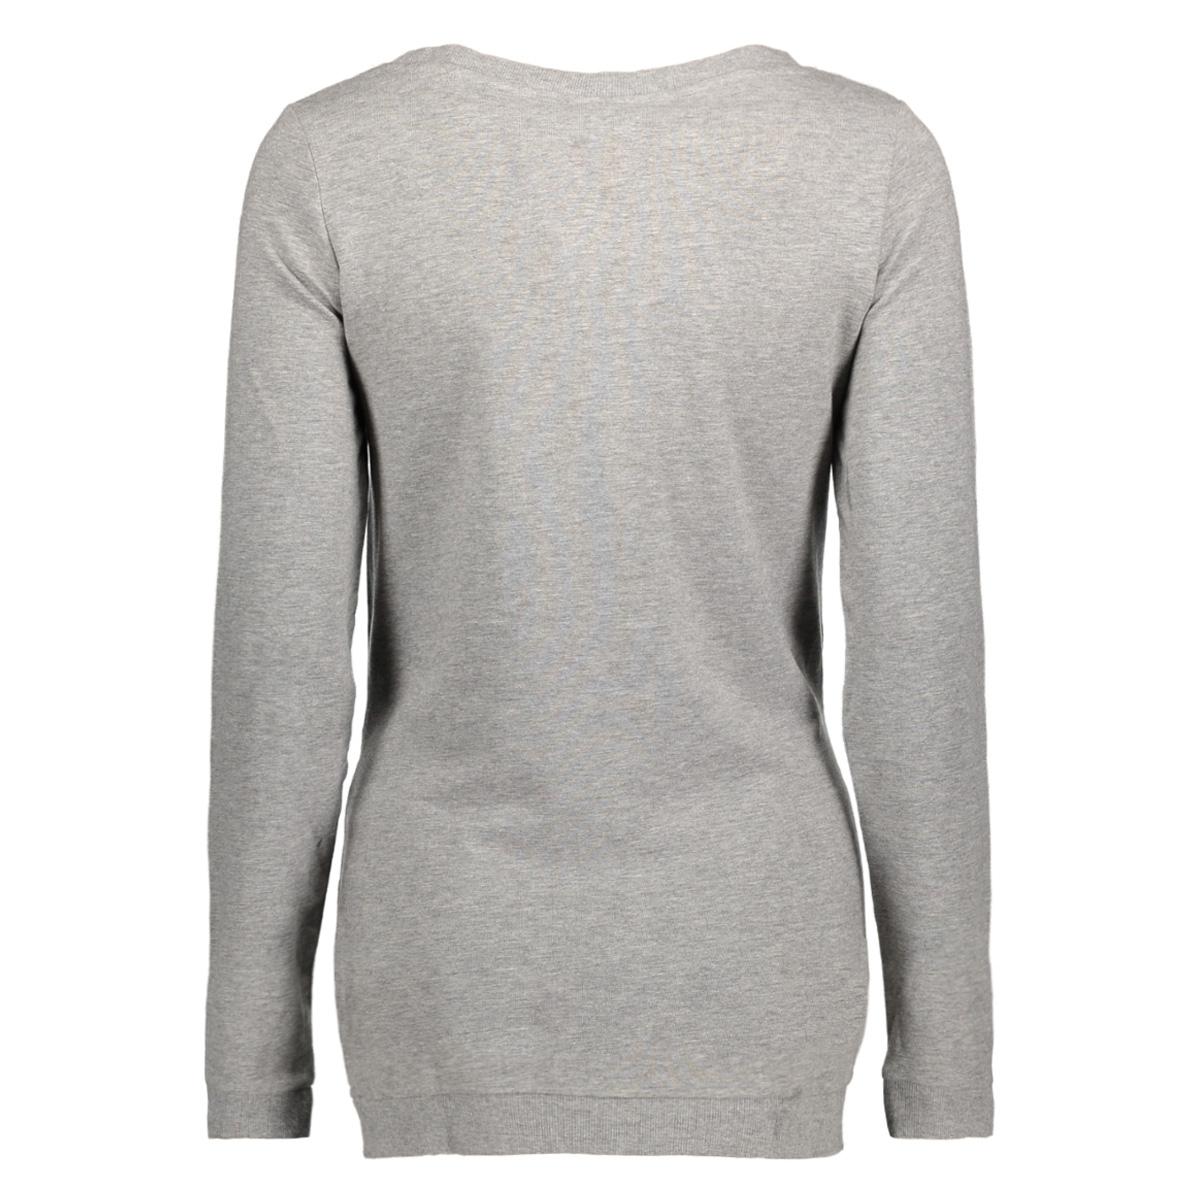 mlsign l/s sweat top a 20007554 mama-licious positie trui light grey mela/white fron